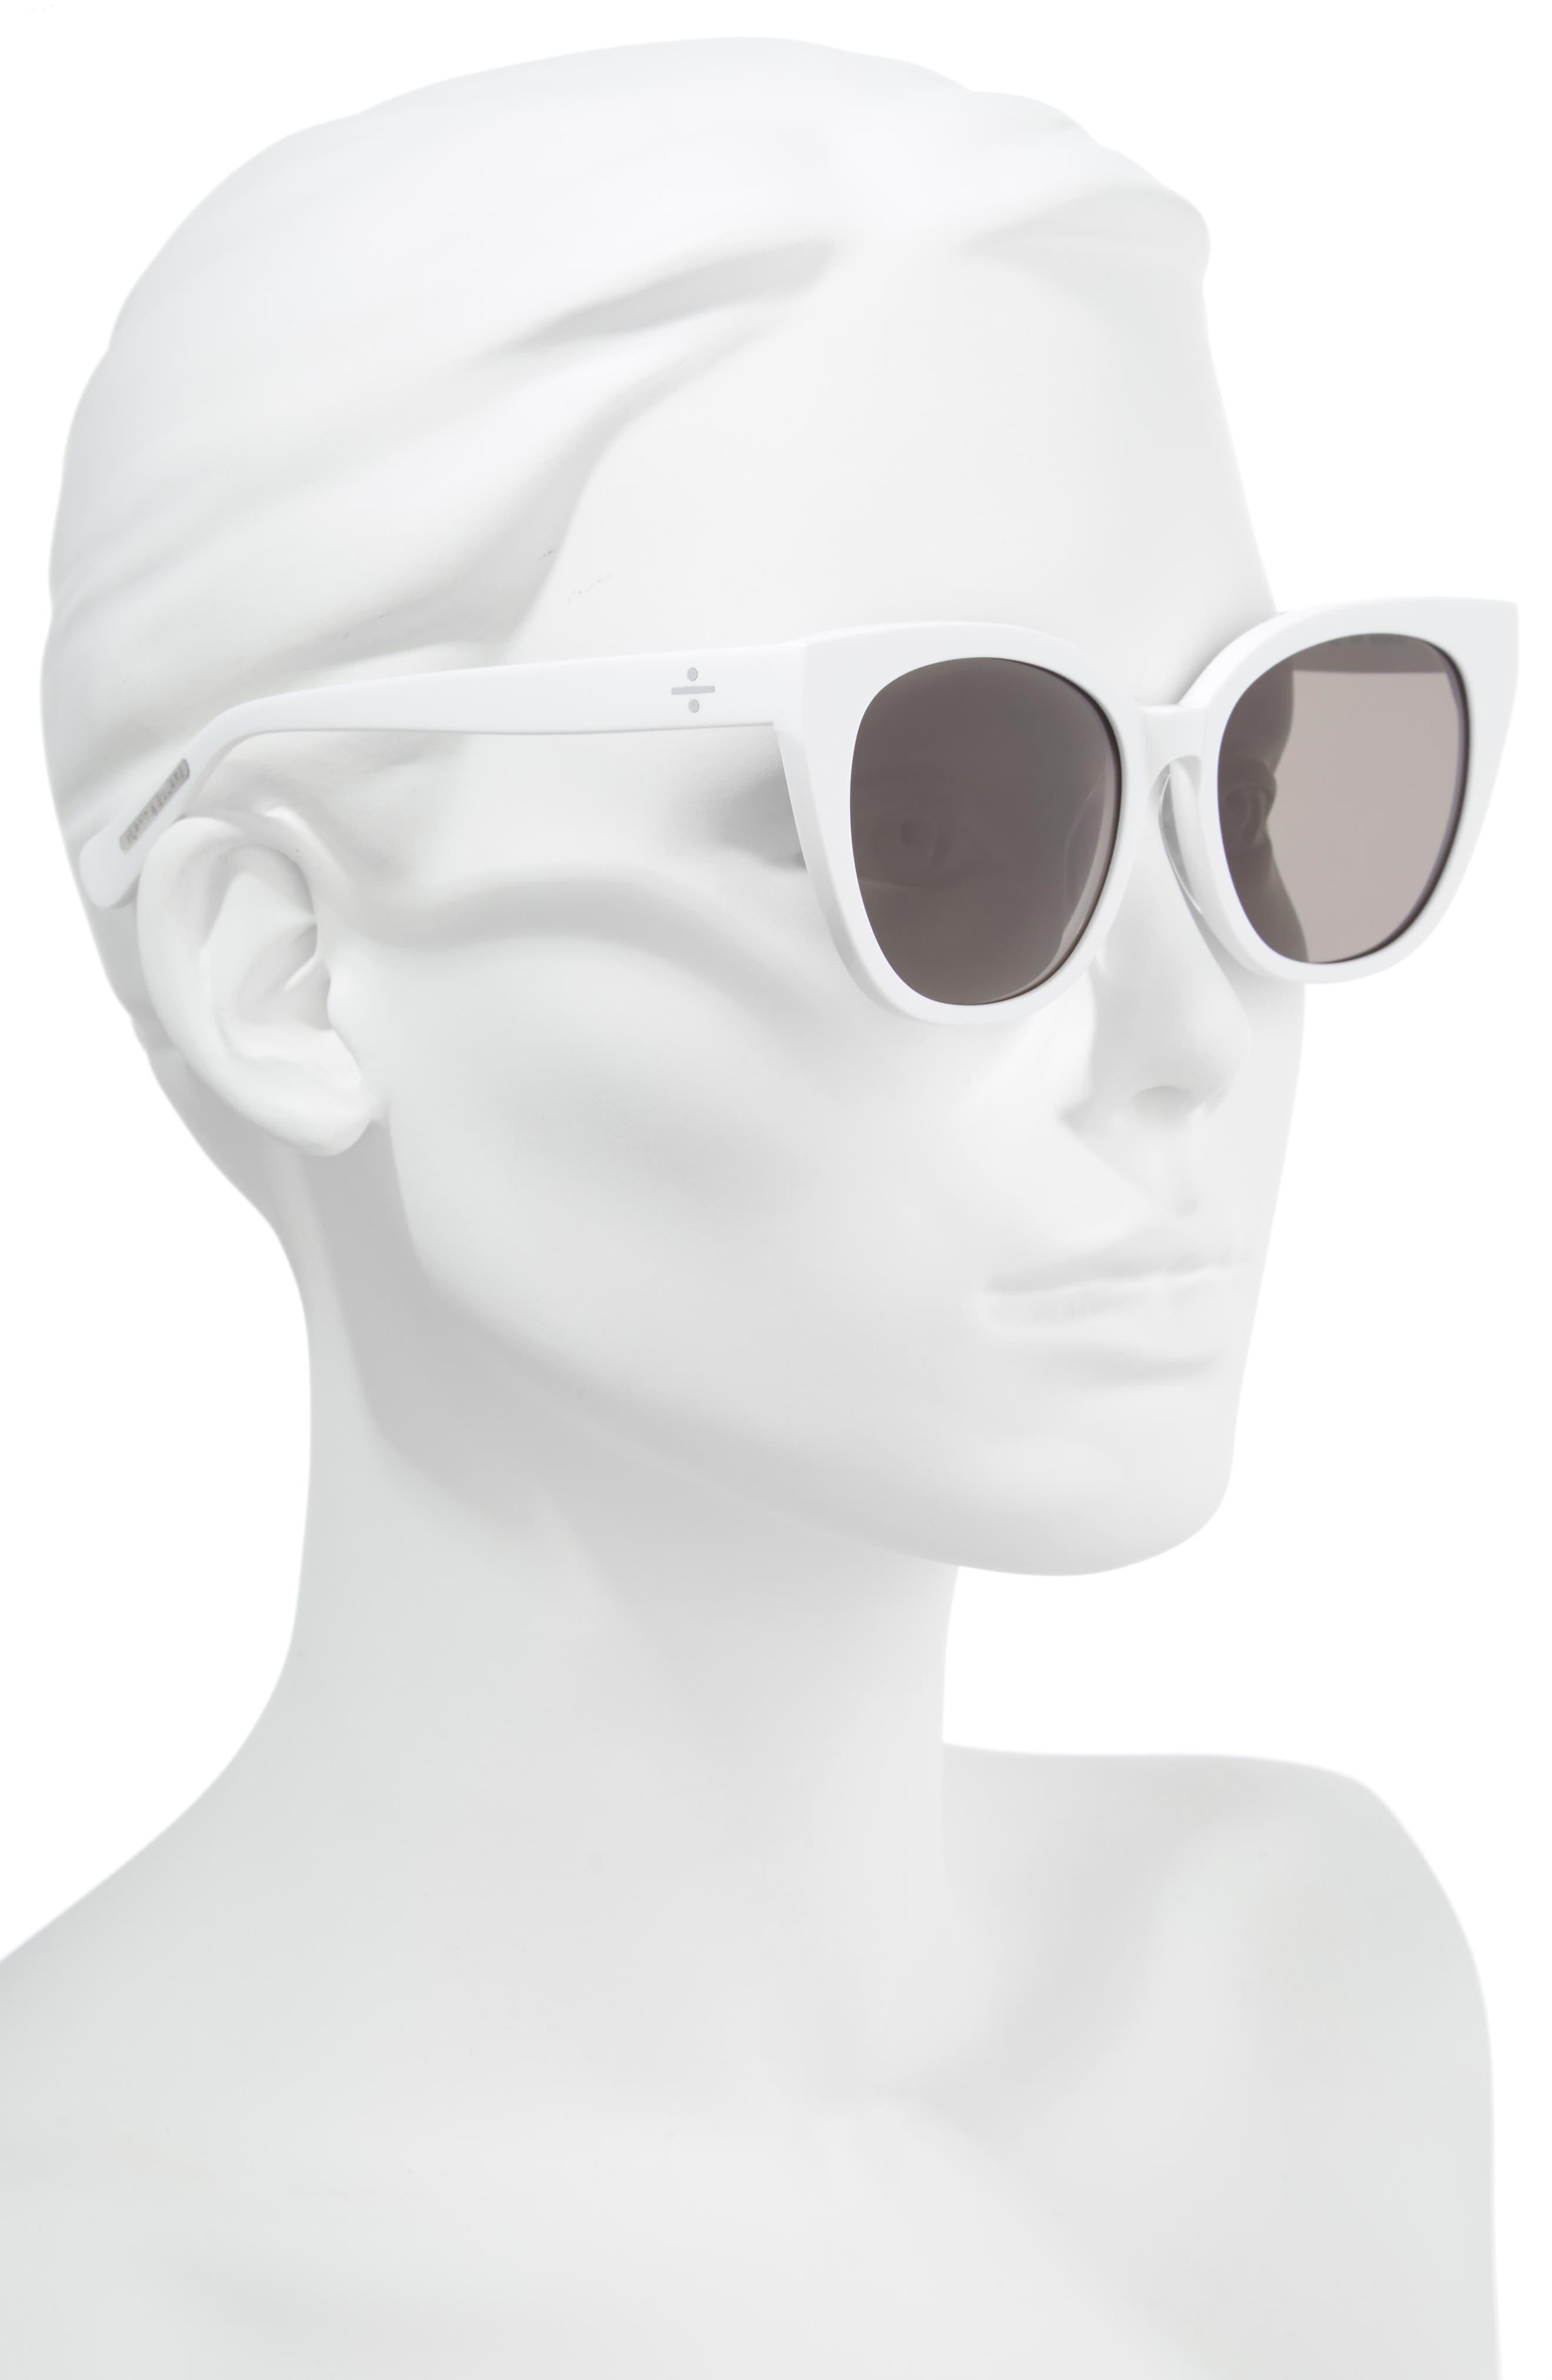 BLANC & ECLARE Monaco 54mm Cat Eye Sunglasses,                             Alternate thumbnail 2, color,                             SNOW/ SMOG GREY